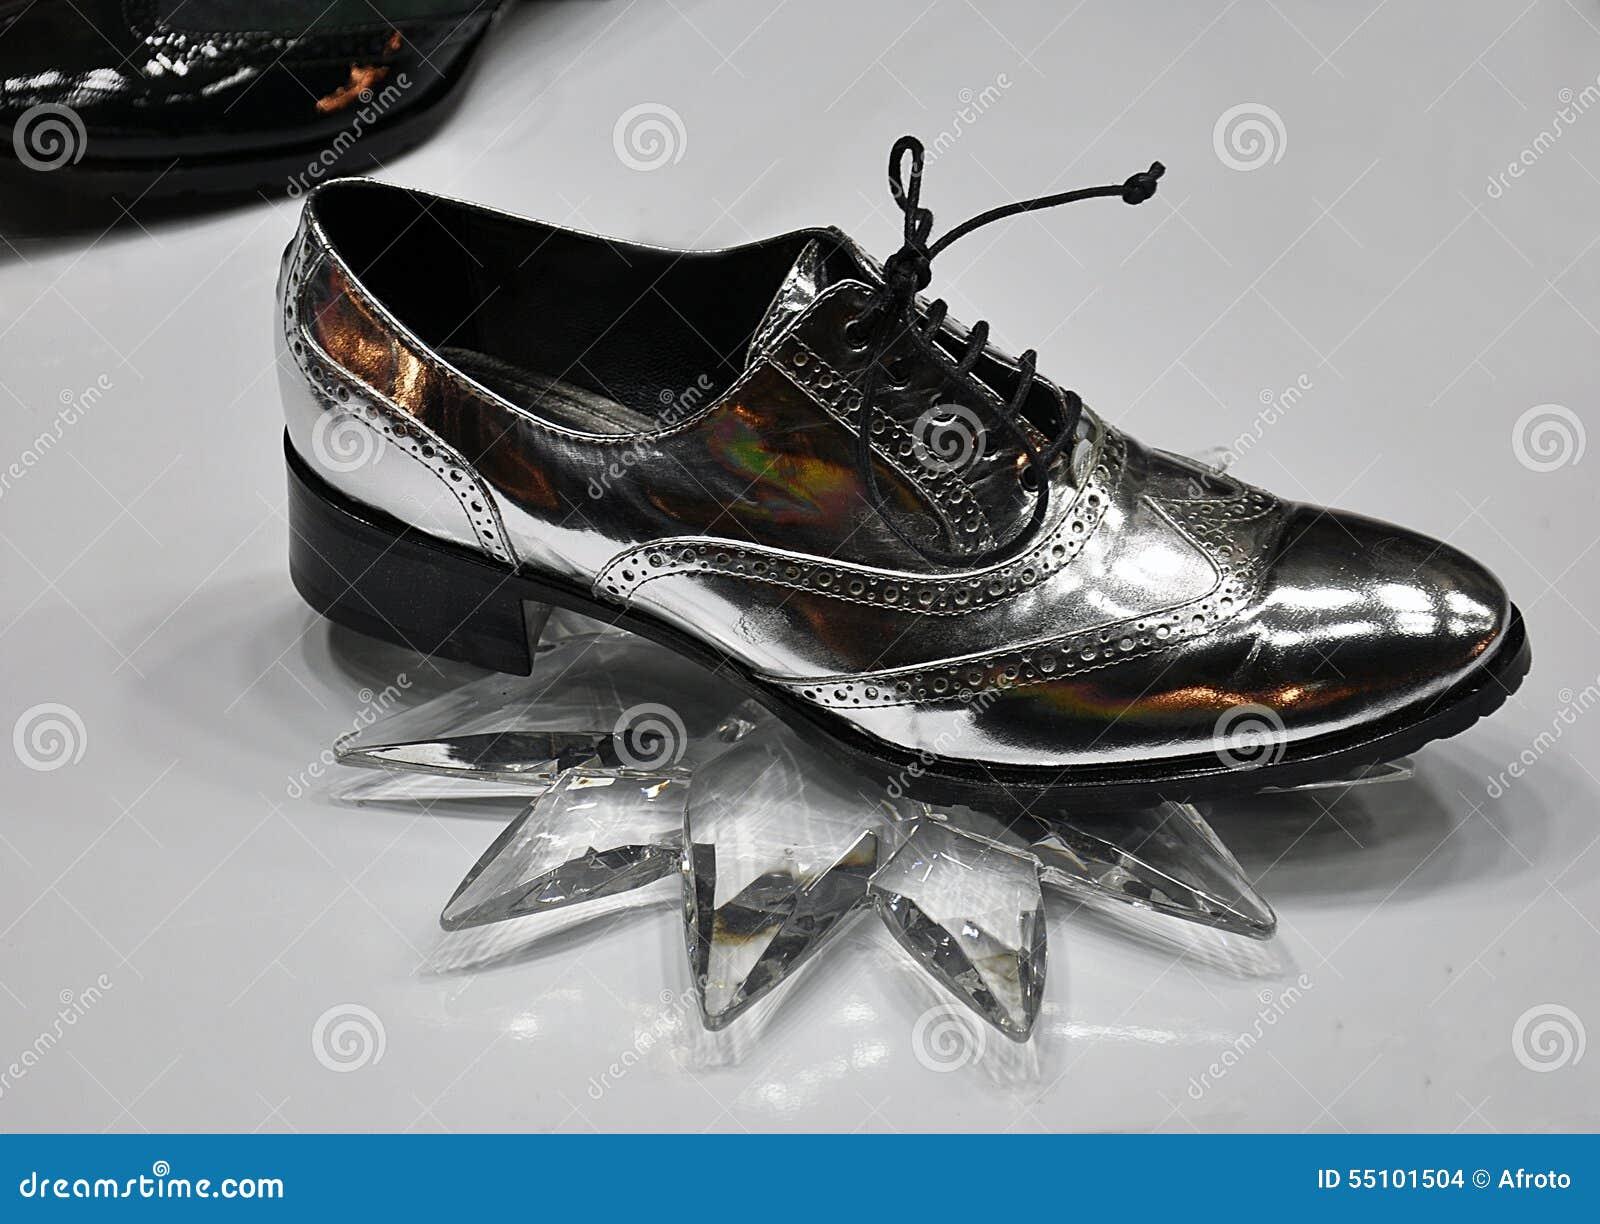 6998b639fdb Ασημένια γυναικεία παπούτσια Στοκ Εικόνες - εικόνα από άνετος ...